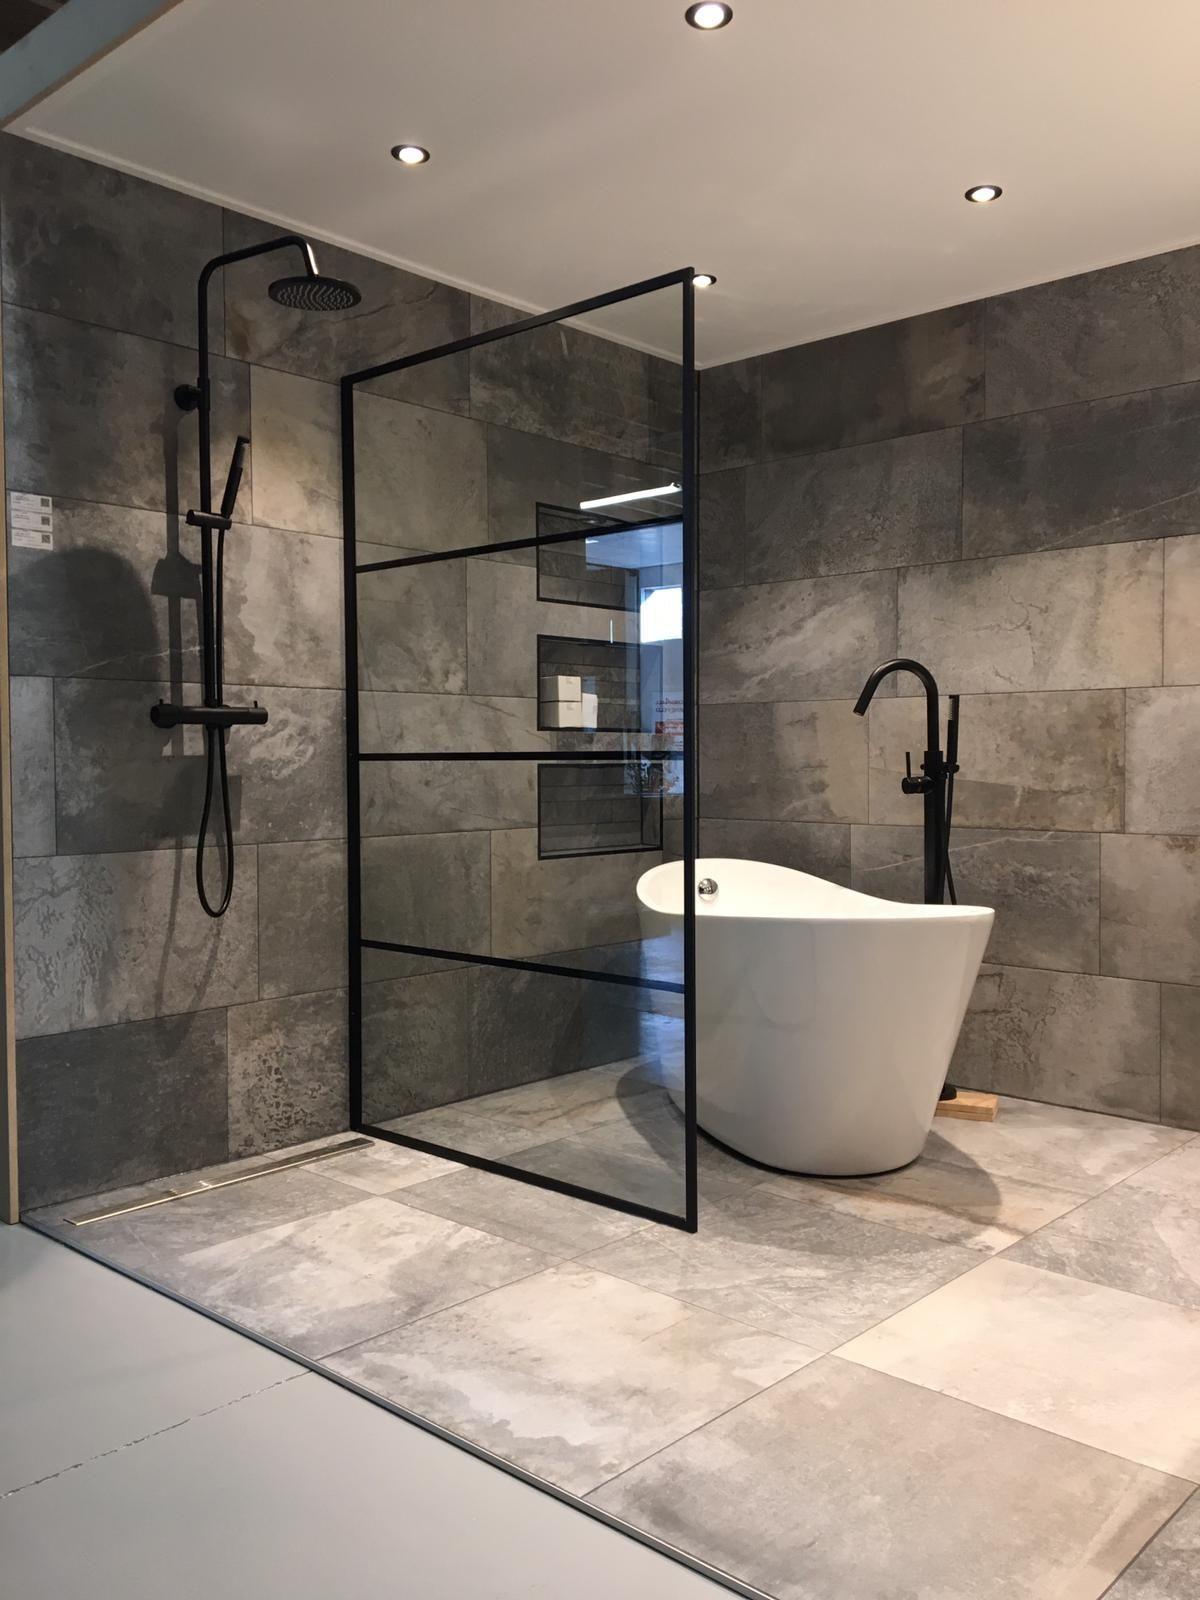 Bathroomdesignshowroom also new house in pinterest bathroom rh